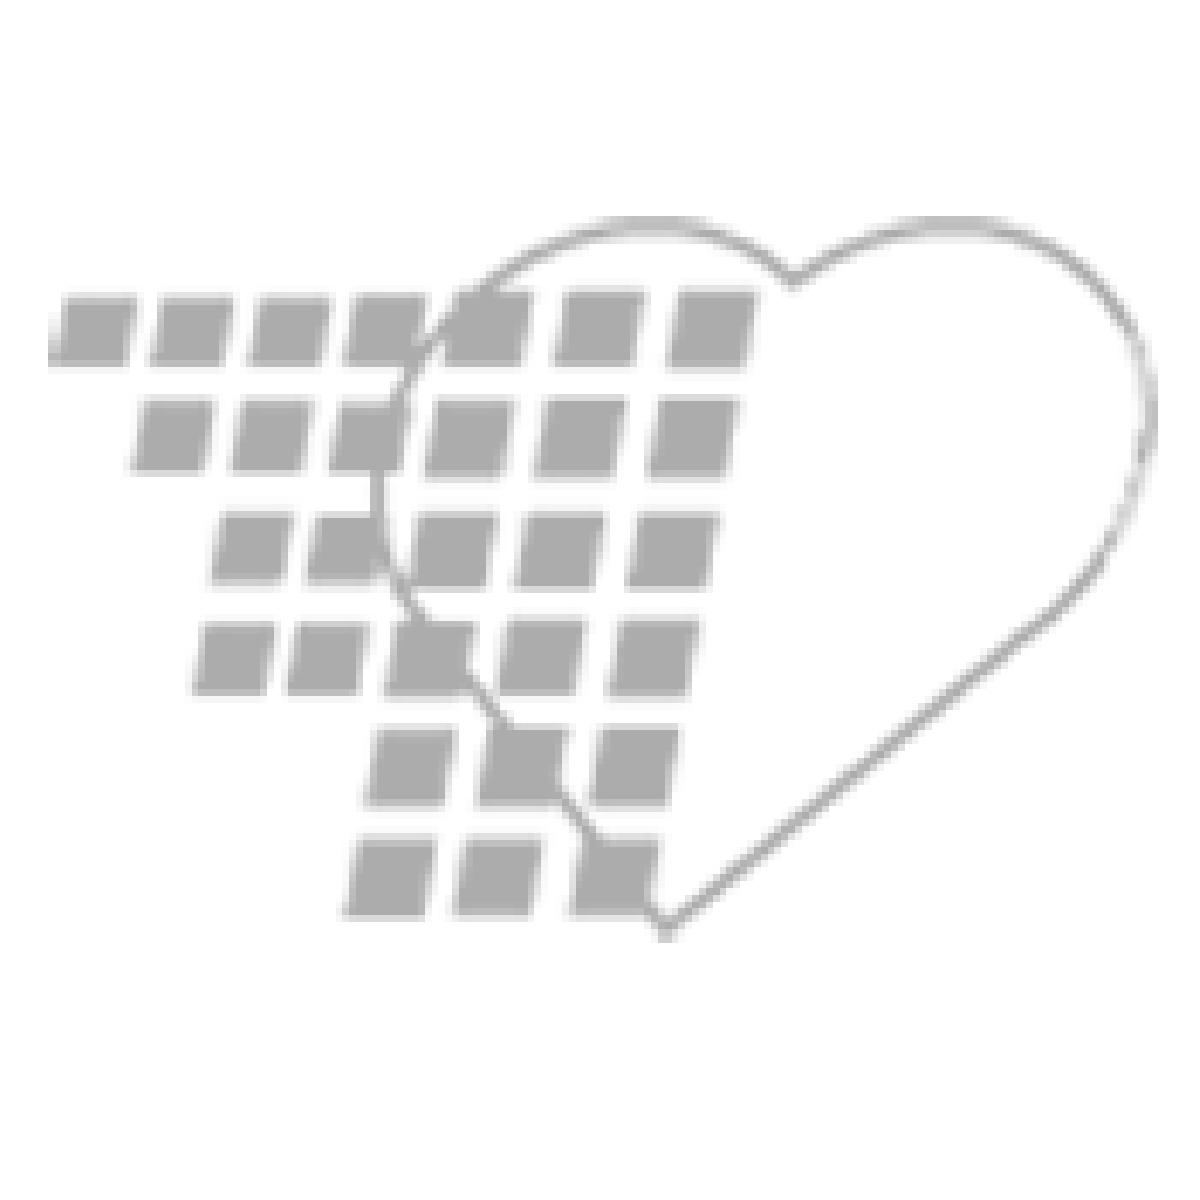 04-50-3601 - Clinton Nurse/Recovery Room